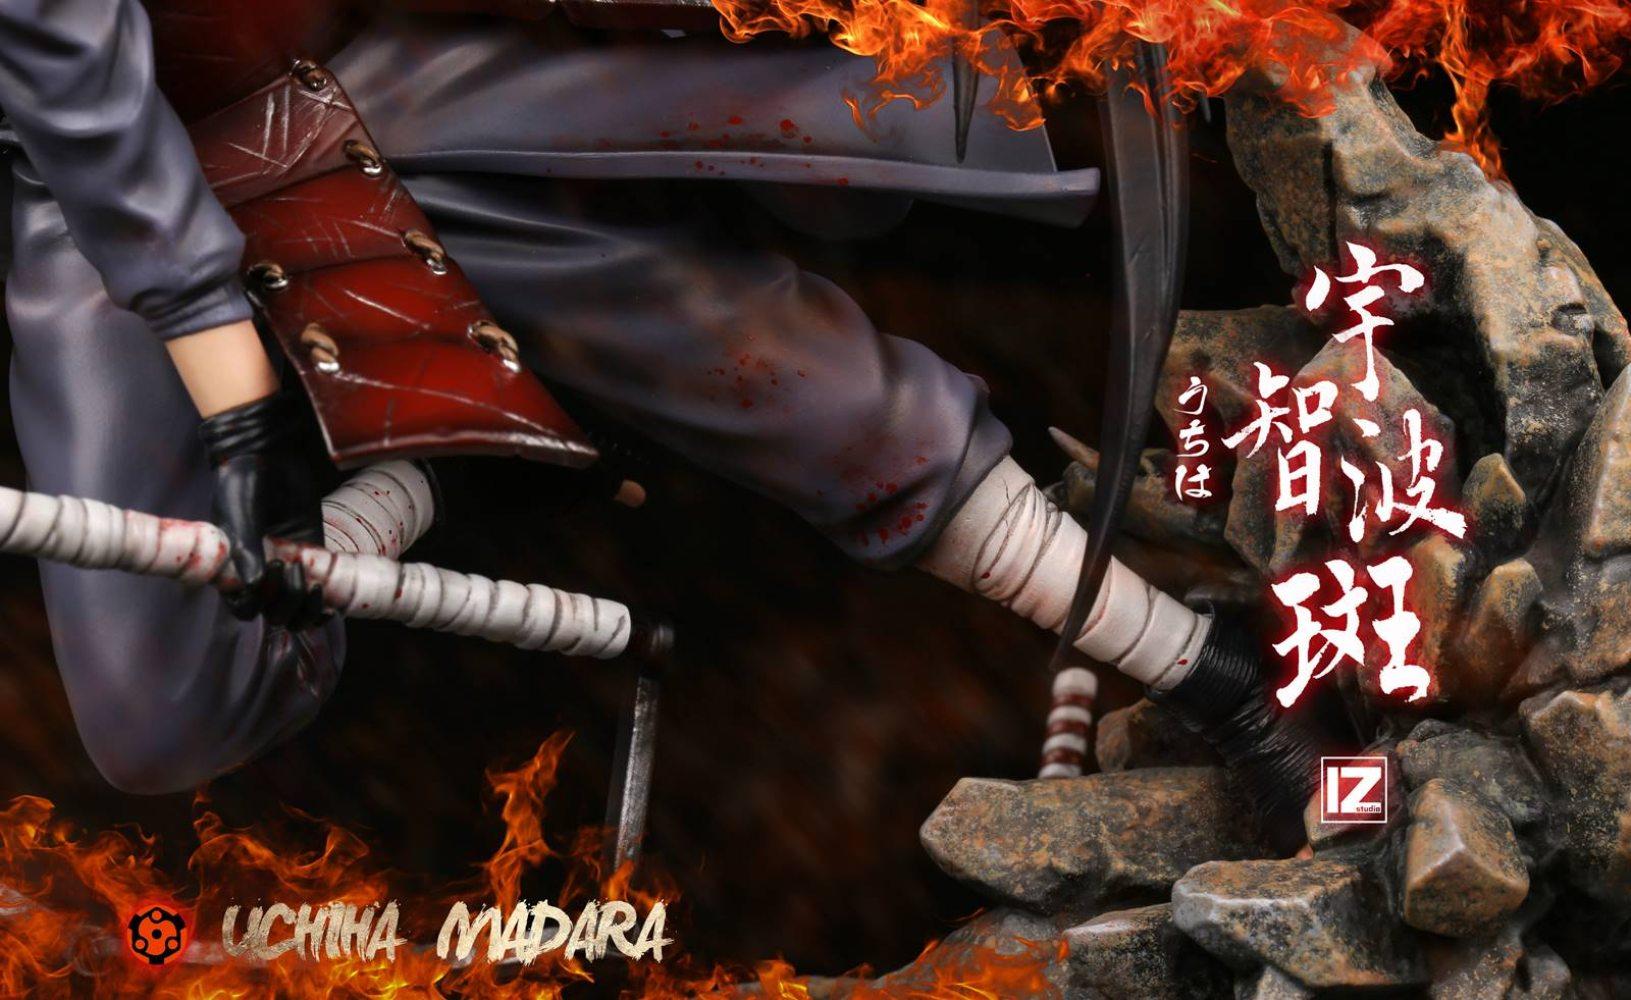 PRÉ VENDA: Estátua Madara Uchiha: Naruto Shippuden - IZ Studio